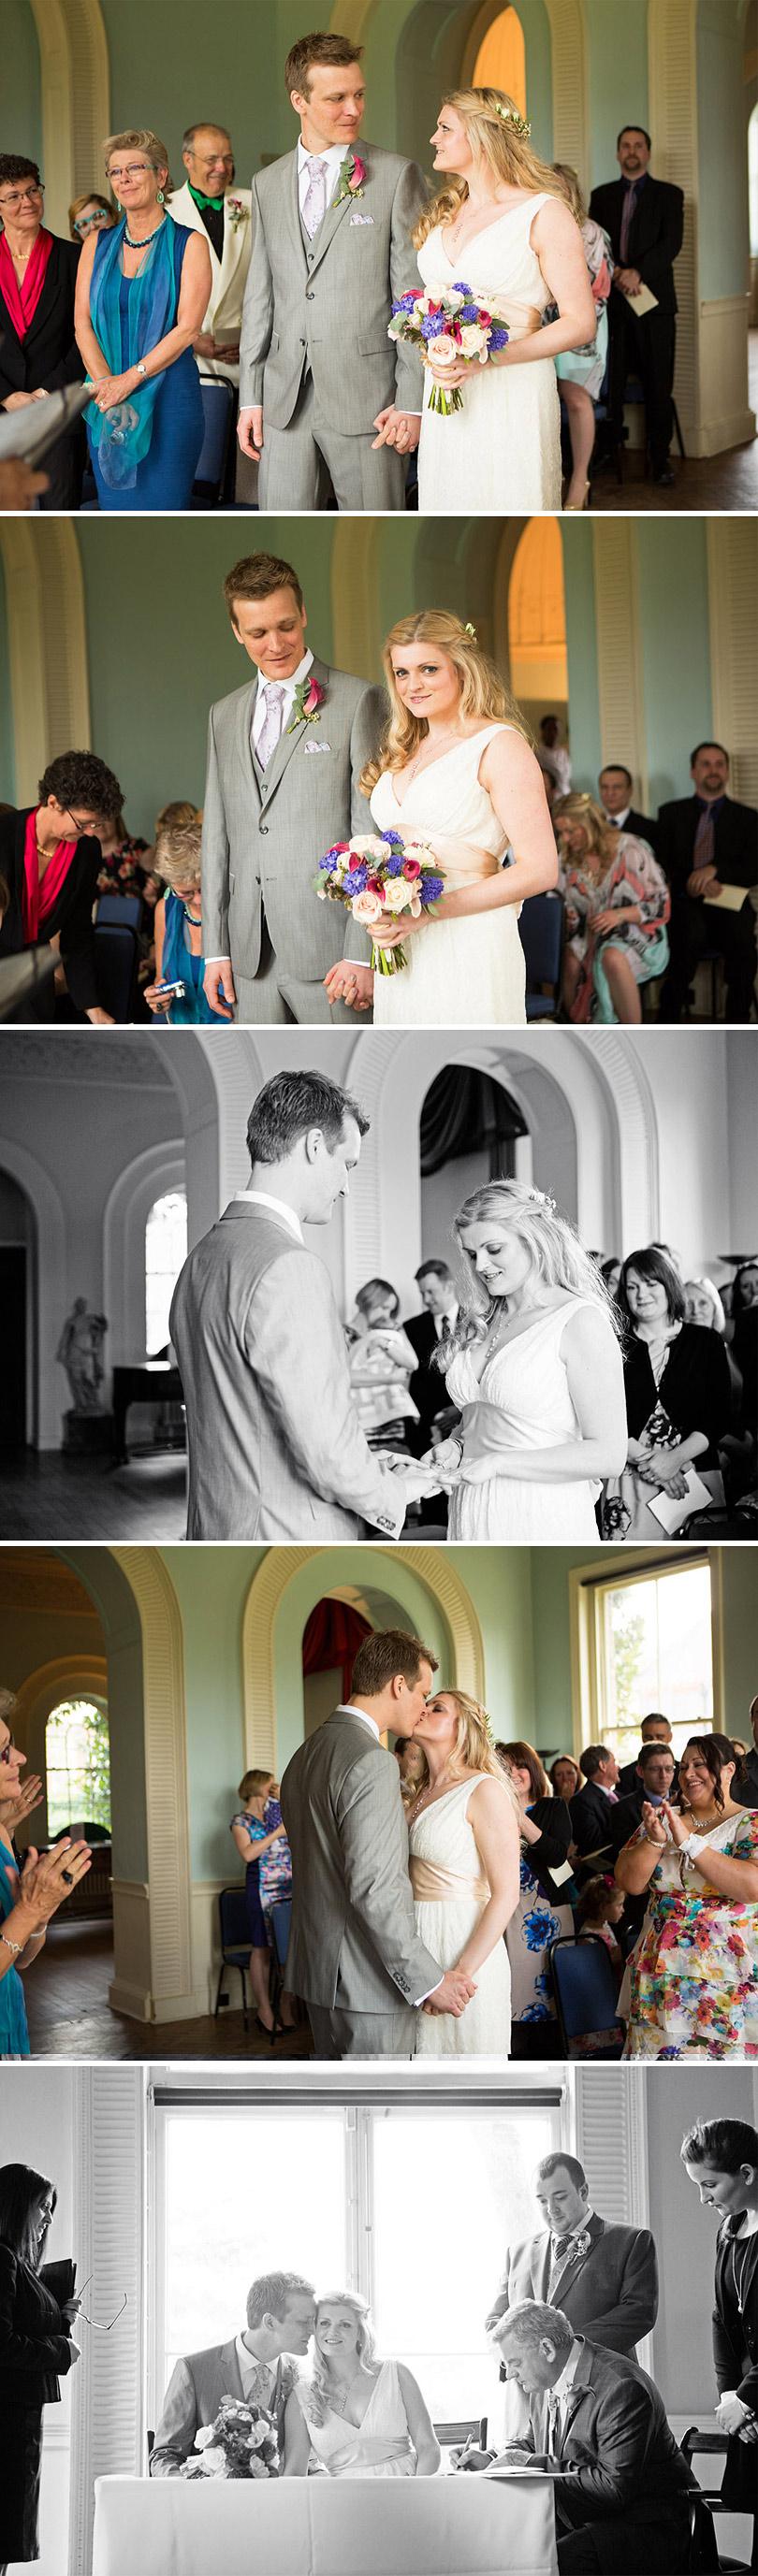 PM-Gallery-Ealing-Wedding-4.jpg